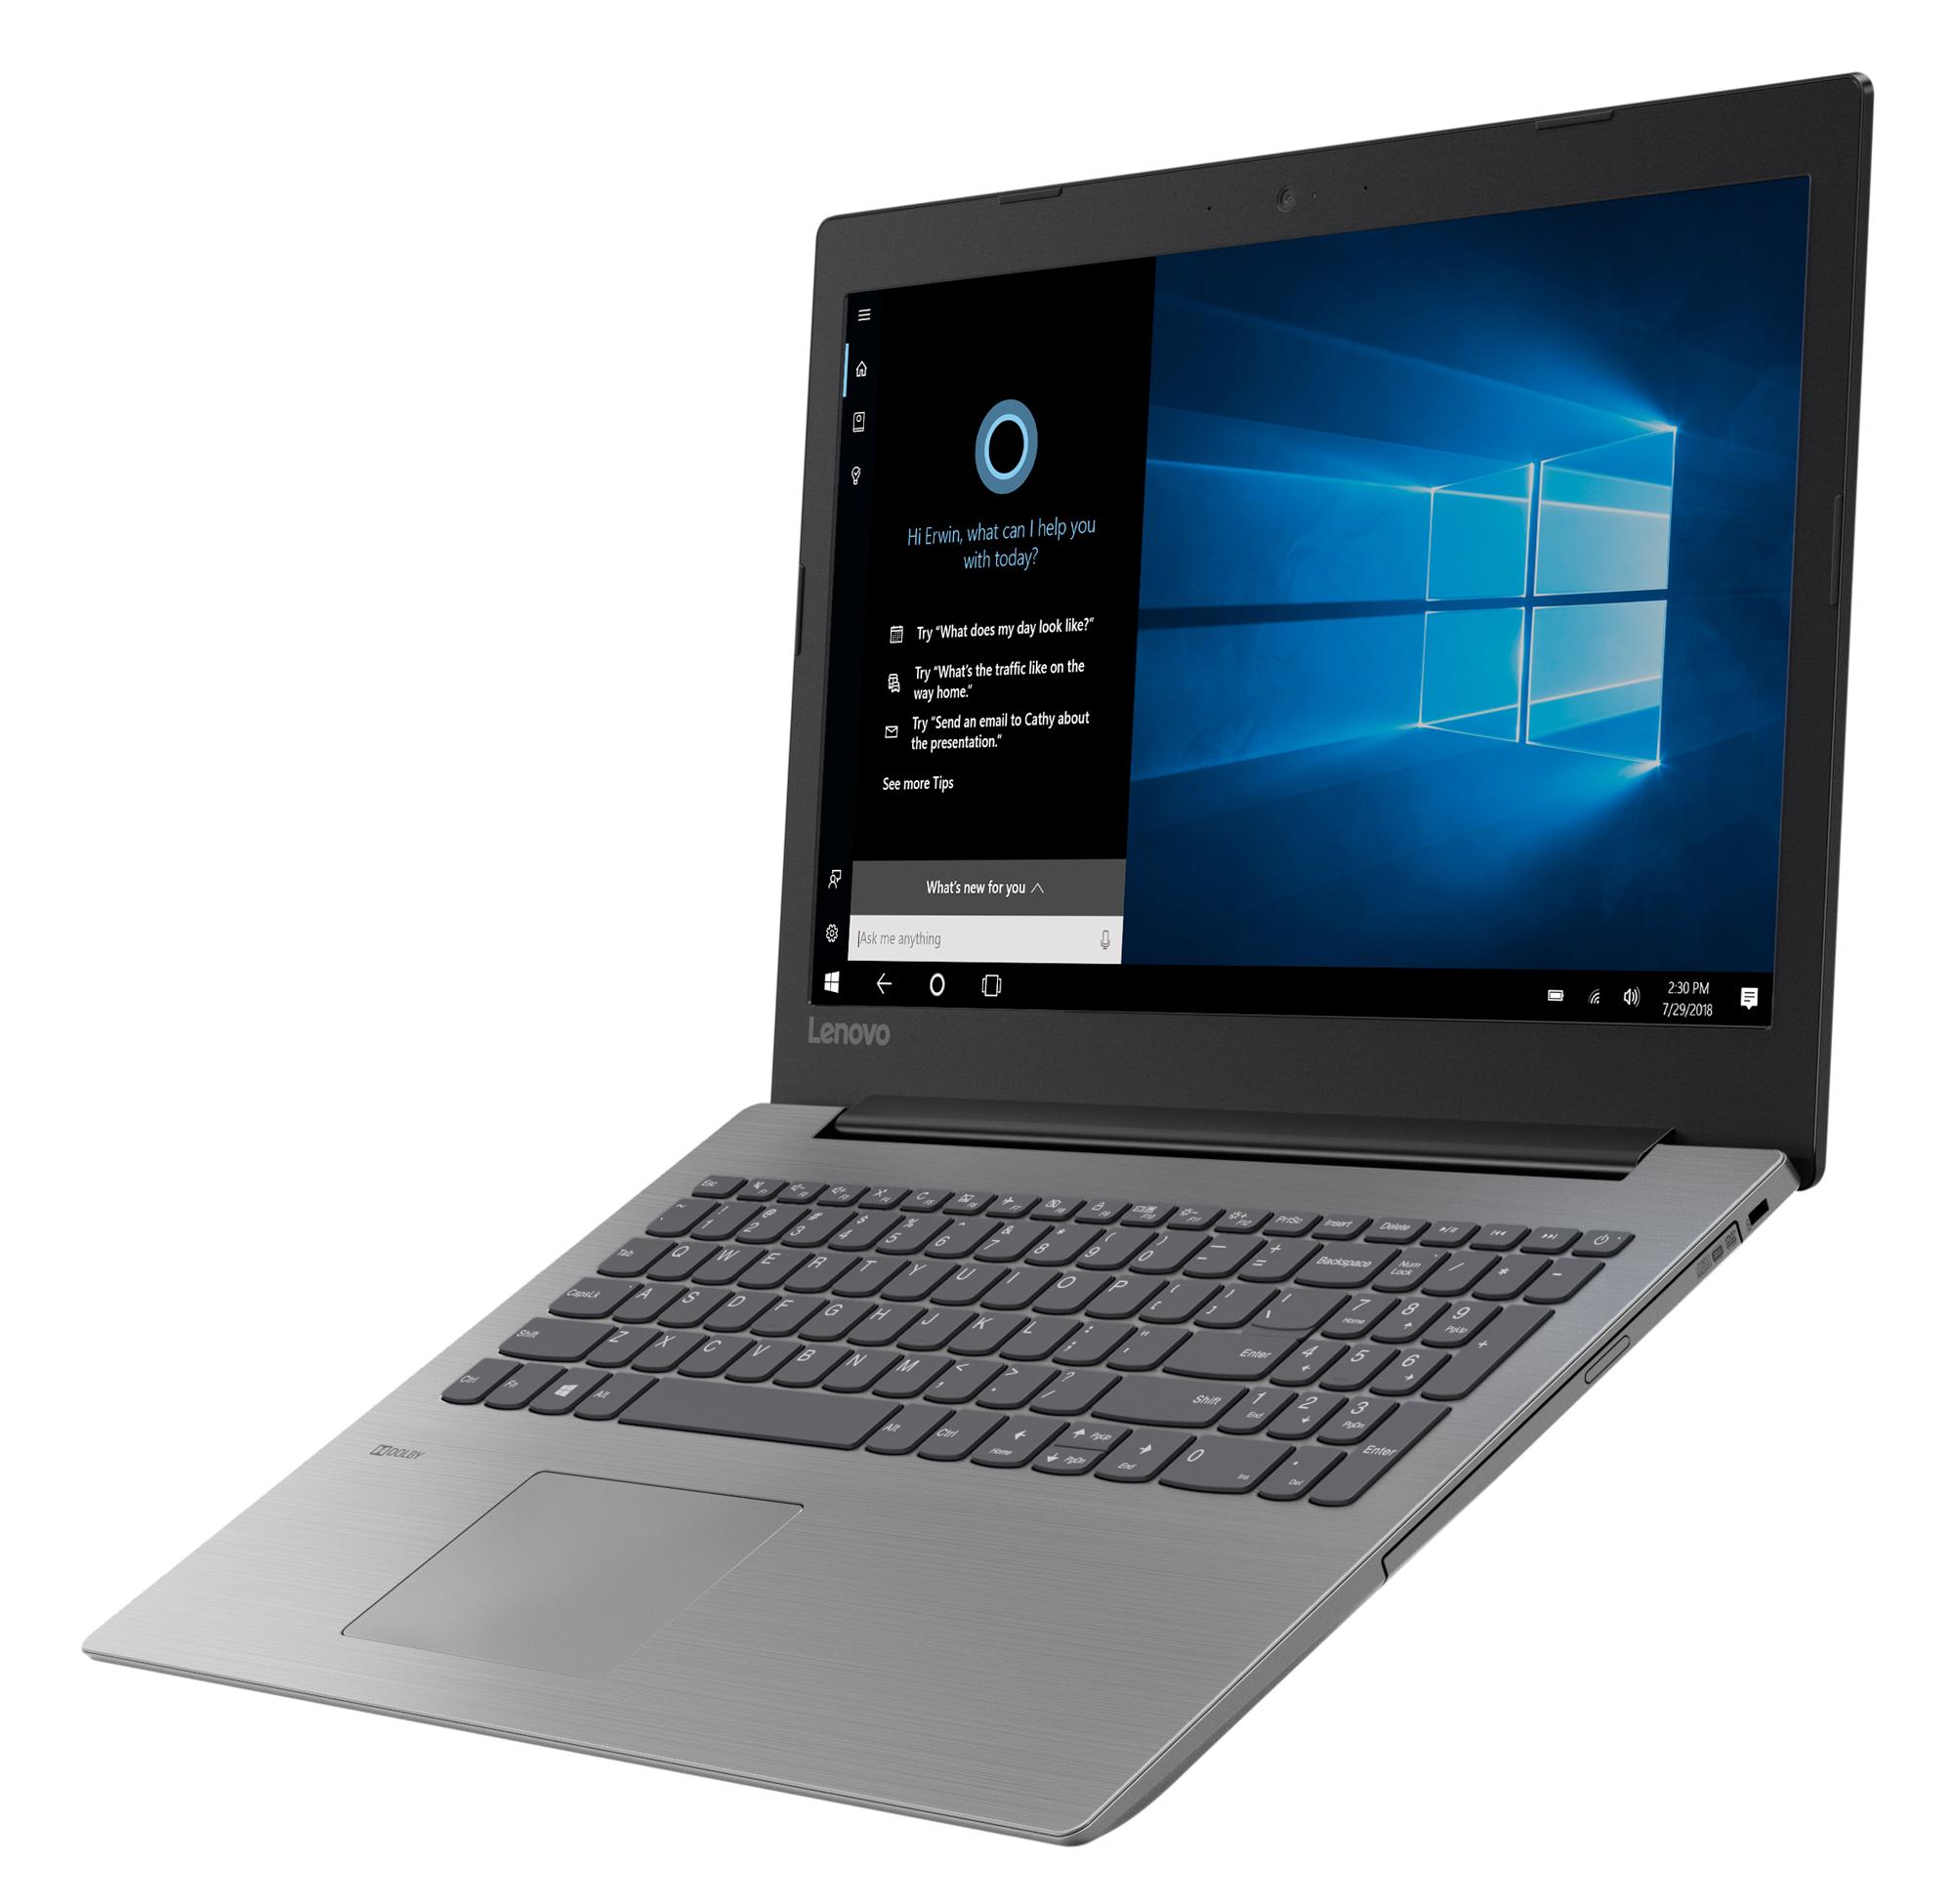 Фото  Ноутбук Lenovo ideapad 330-15 Onyx Black (81DC00JMRA)